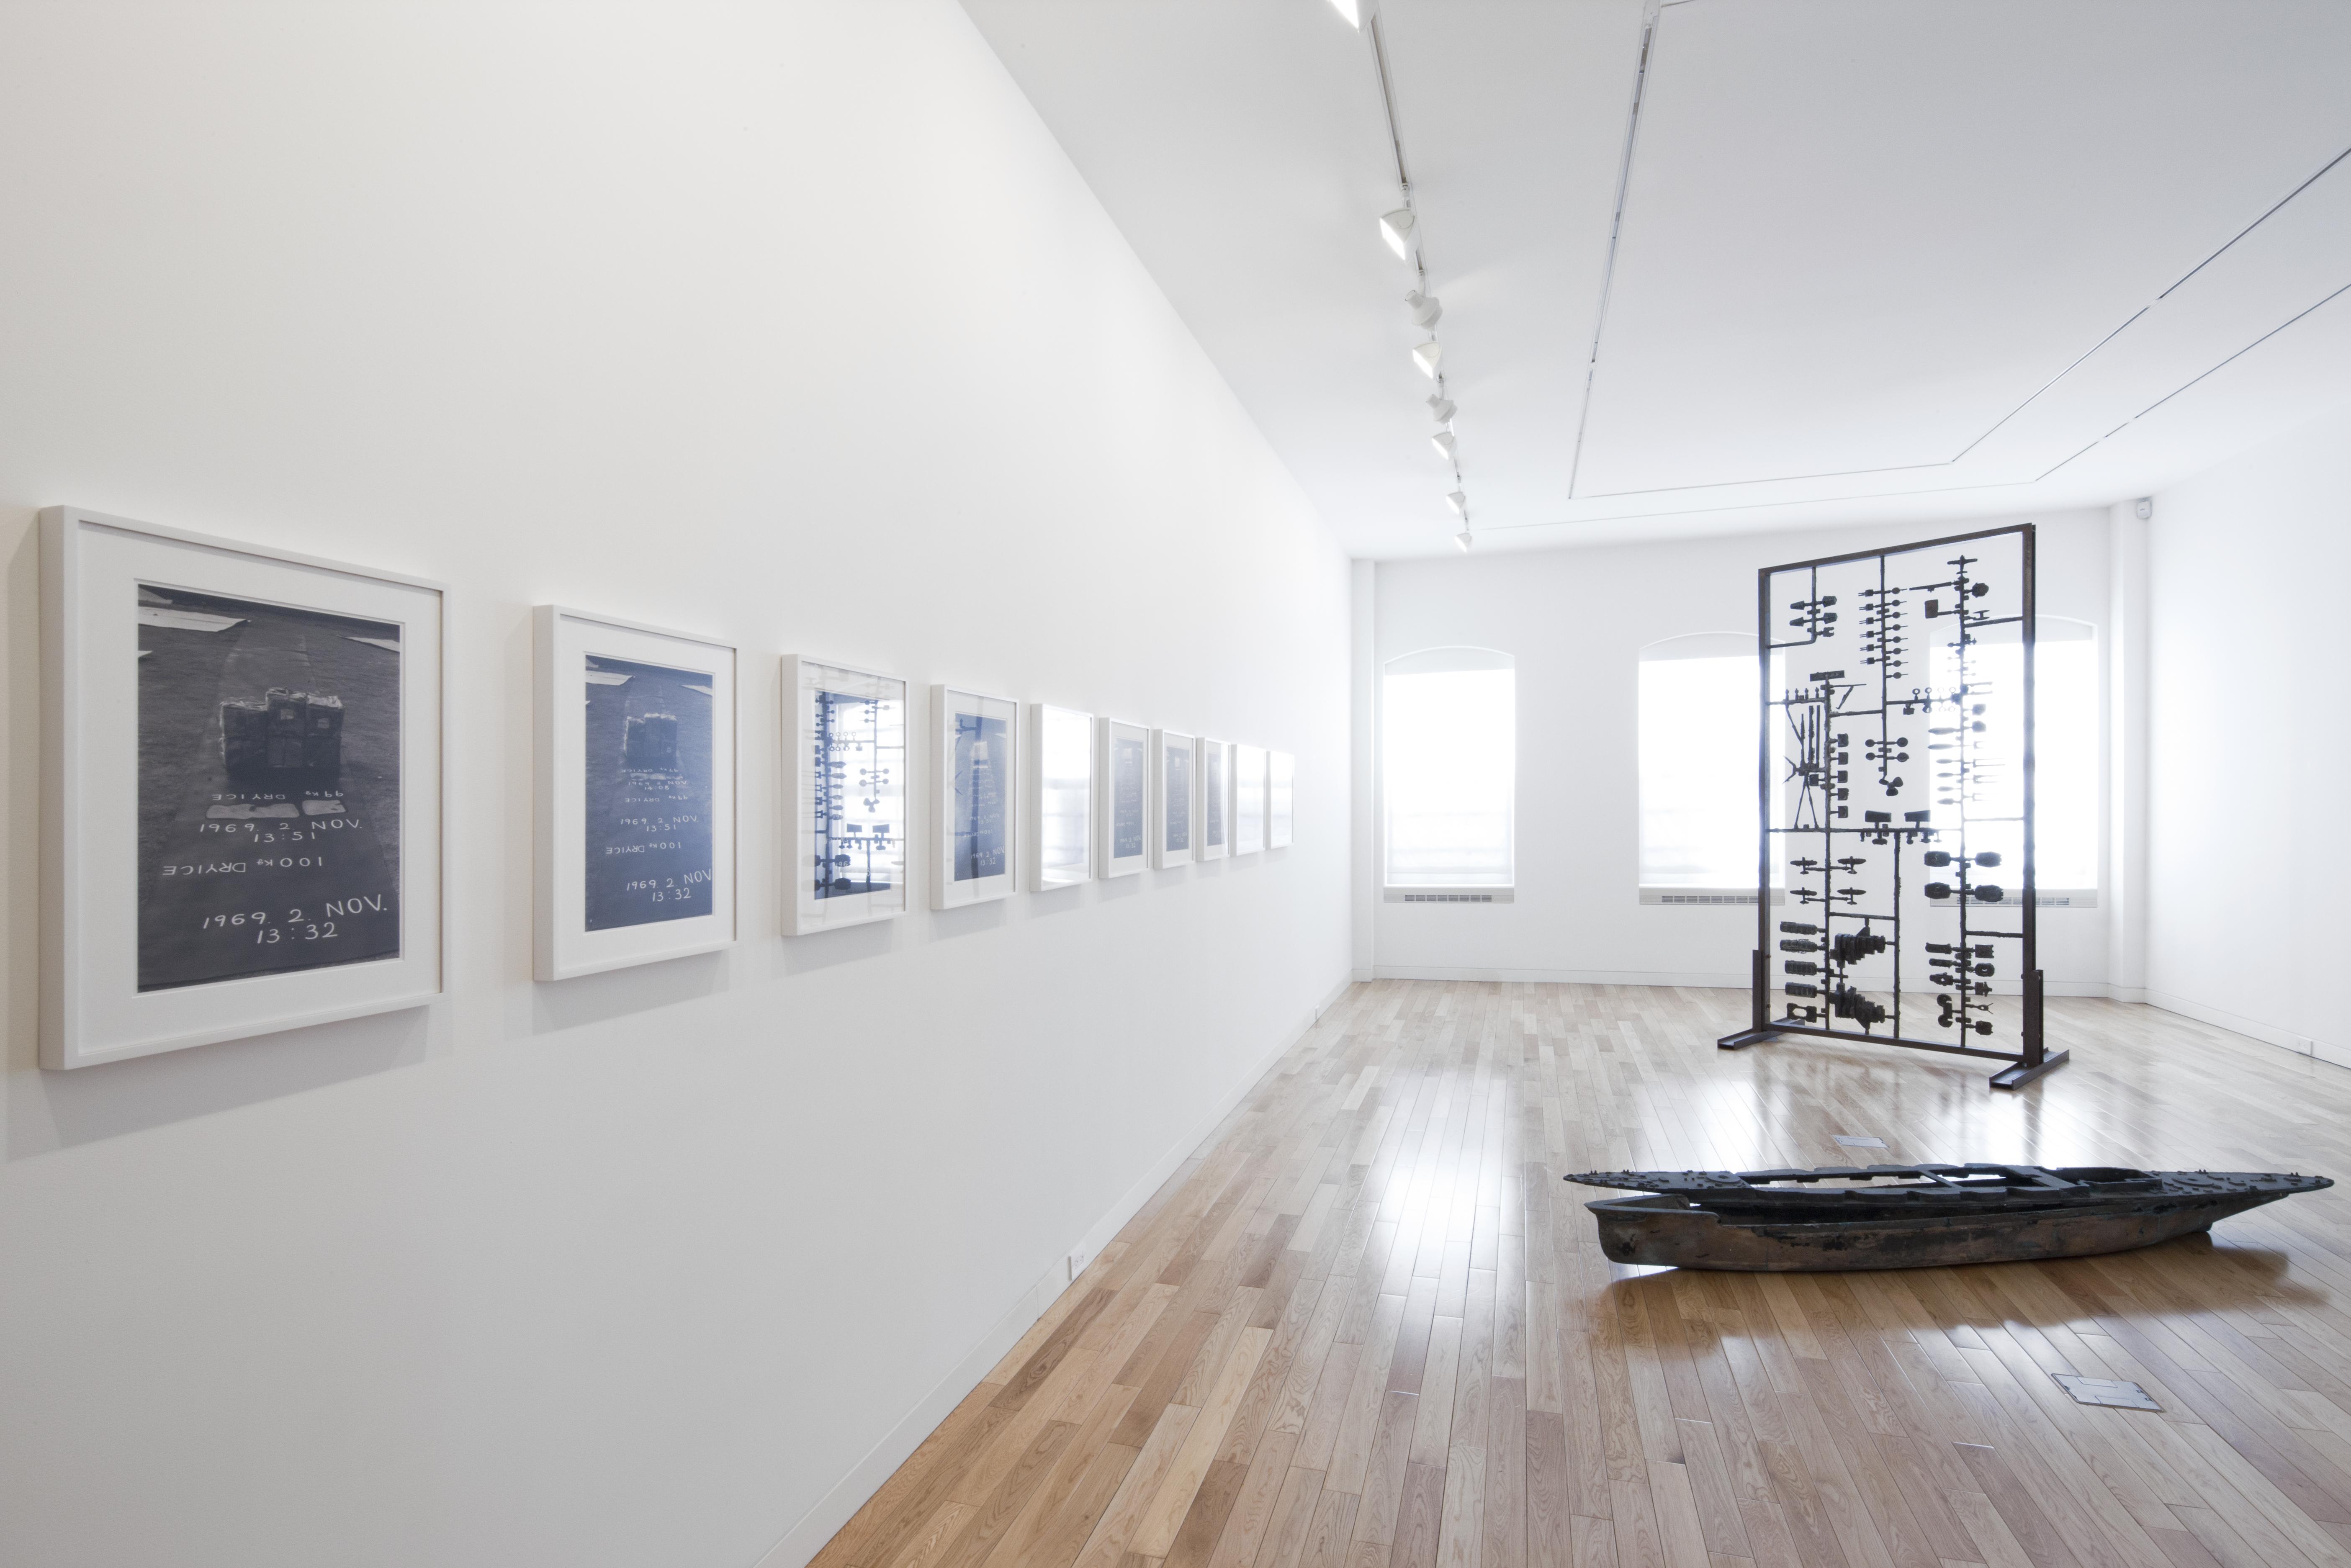 Photograph 3 from Nomura, Polke, Yanagi: Works in Progress exhibition.